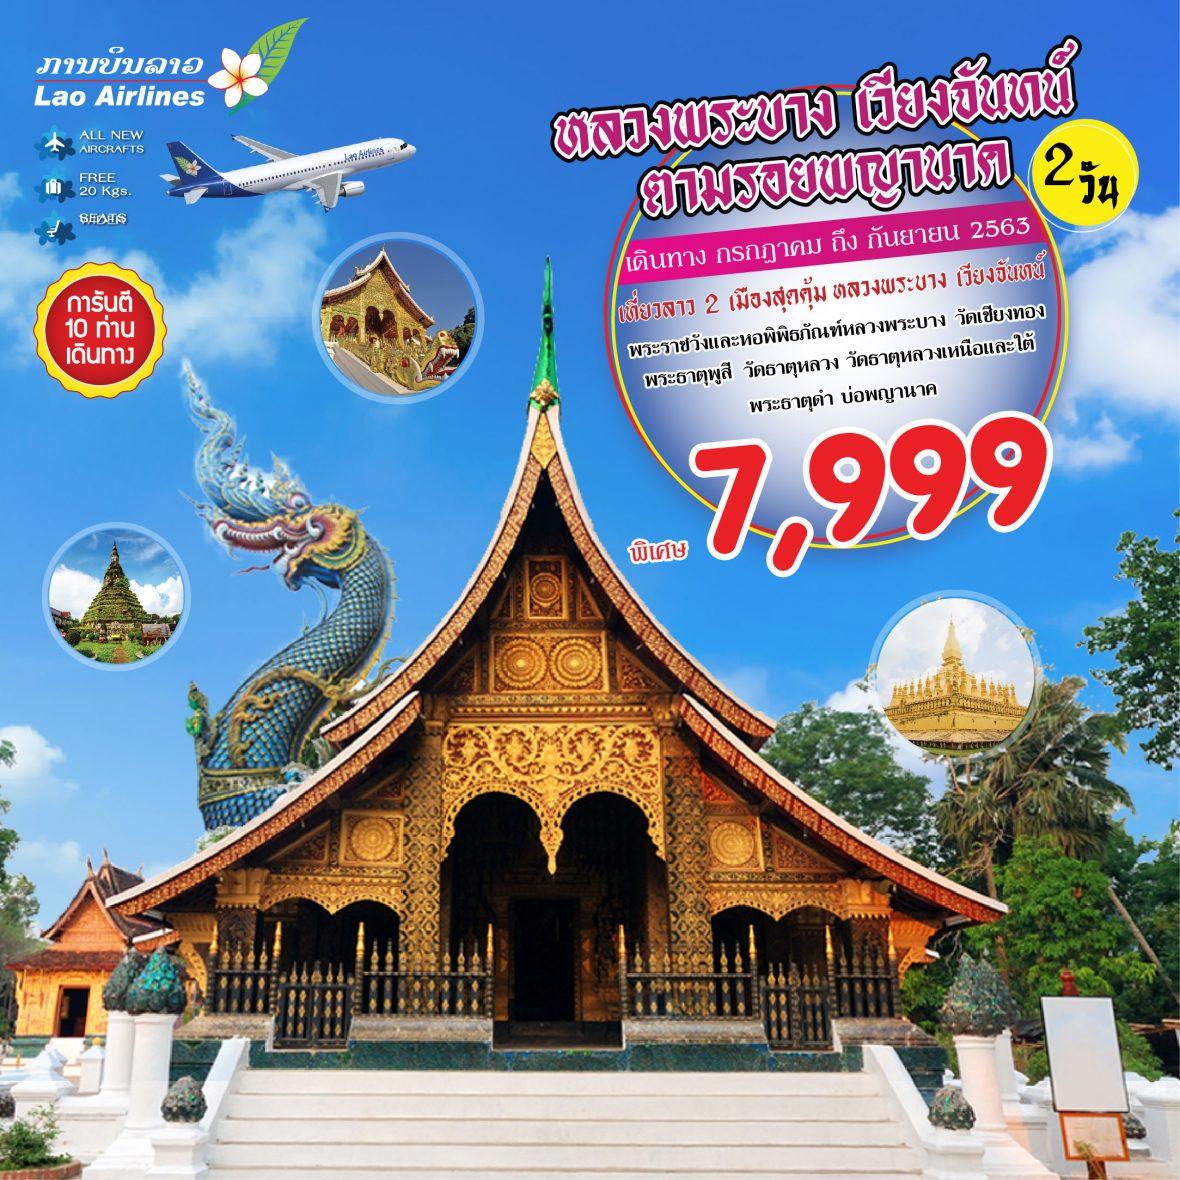 Luang Prabang Vientiane Prayanak_2D_Jul-Sep20_1040-01